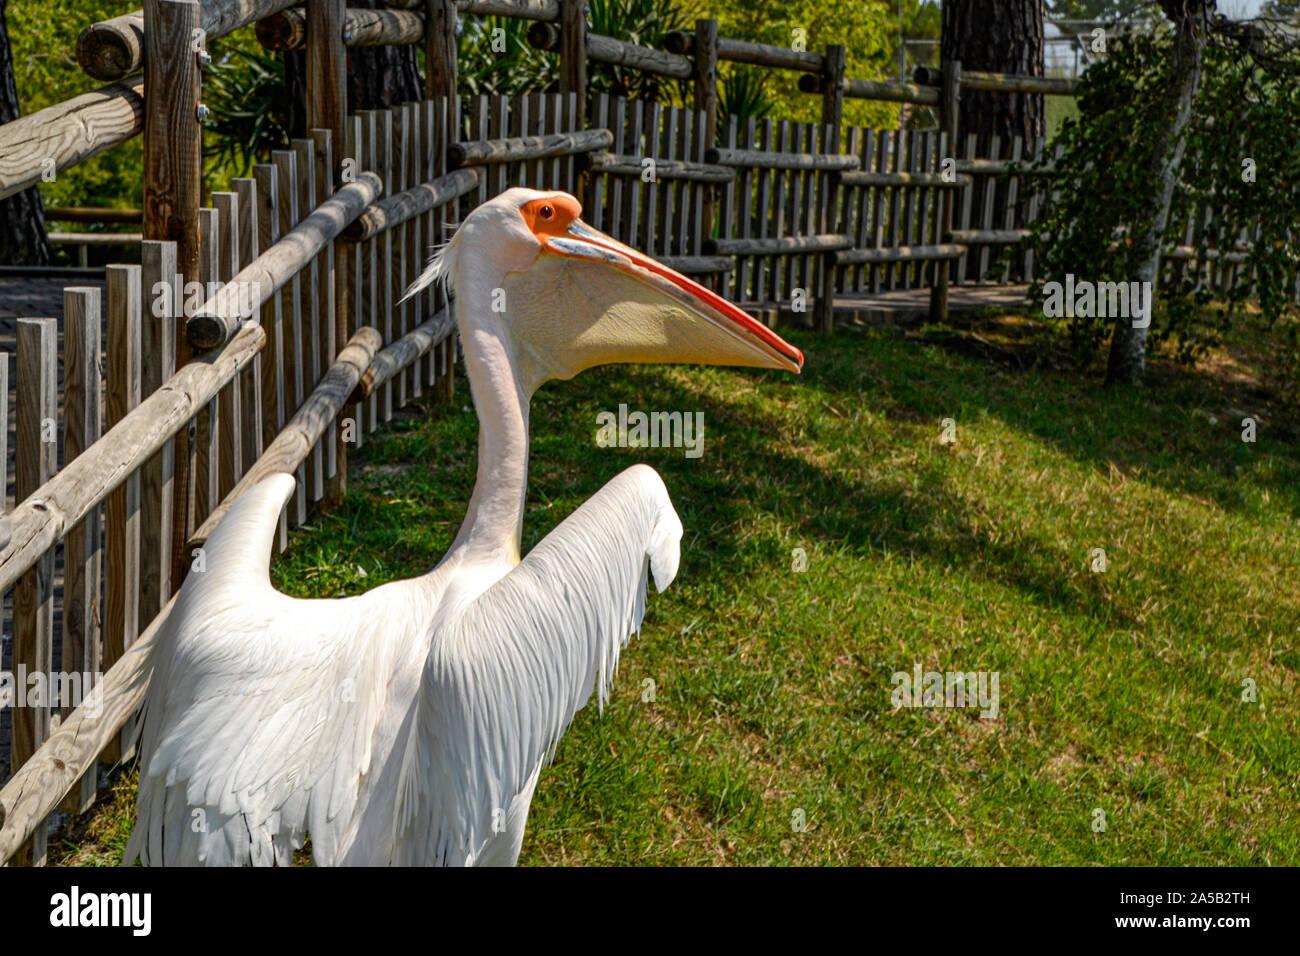 Pelikan im Zoo Punta Verde en Lignano (Italien) / Tierpark en Lignano / Sehenswürdigkeit en Lignano (Italien) / Pelican en el Zoo Punta Verde Foto de stock